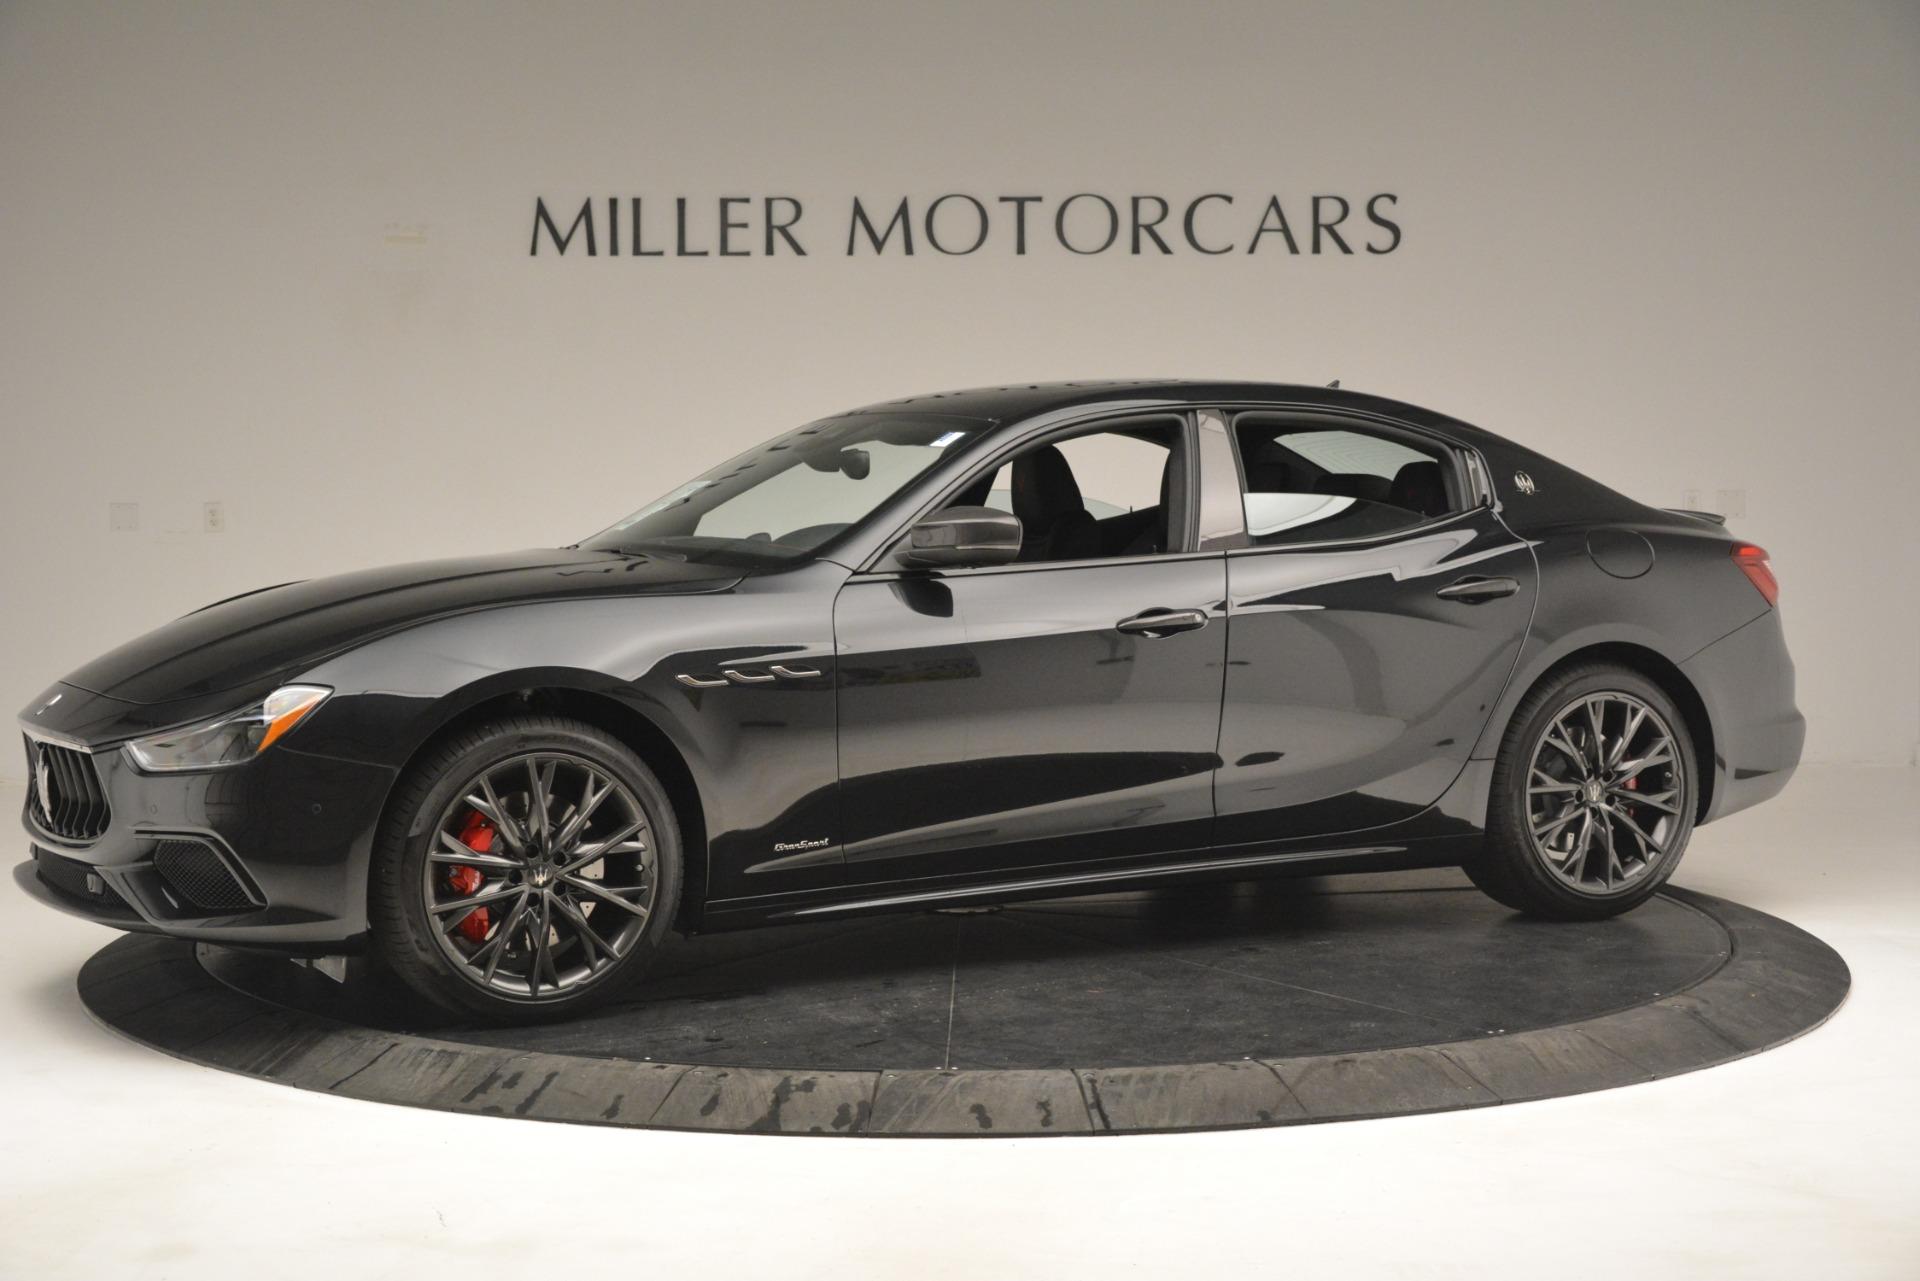 New 2019 Maserati Ghibli S Q4 GranSport For Sale In Greenwich, CT. Alfa Romeo of Greenwich, W668 2926_p2